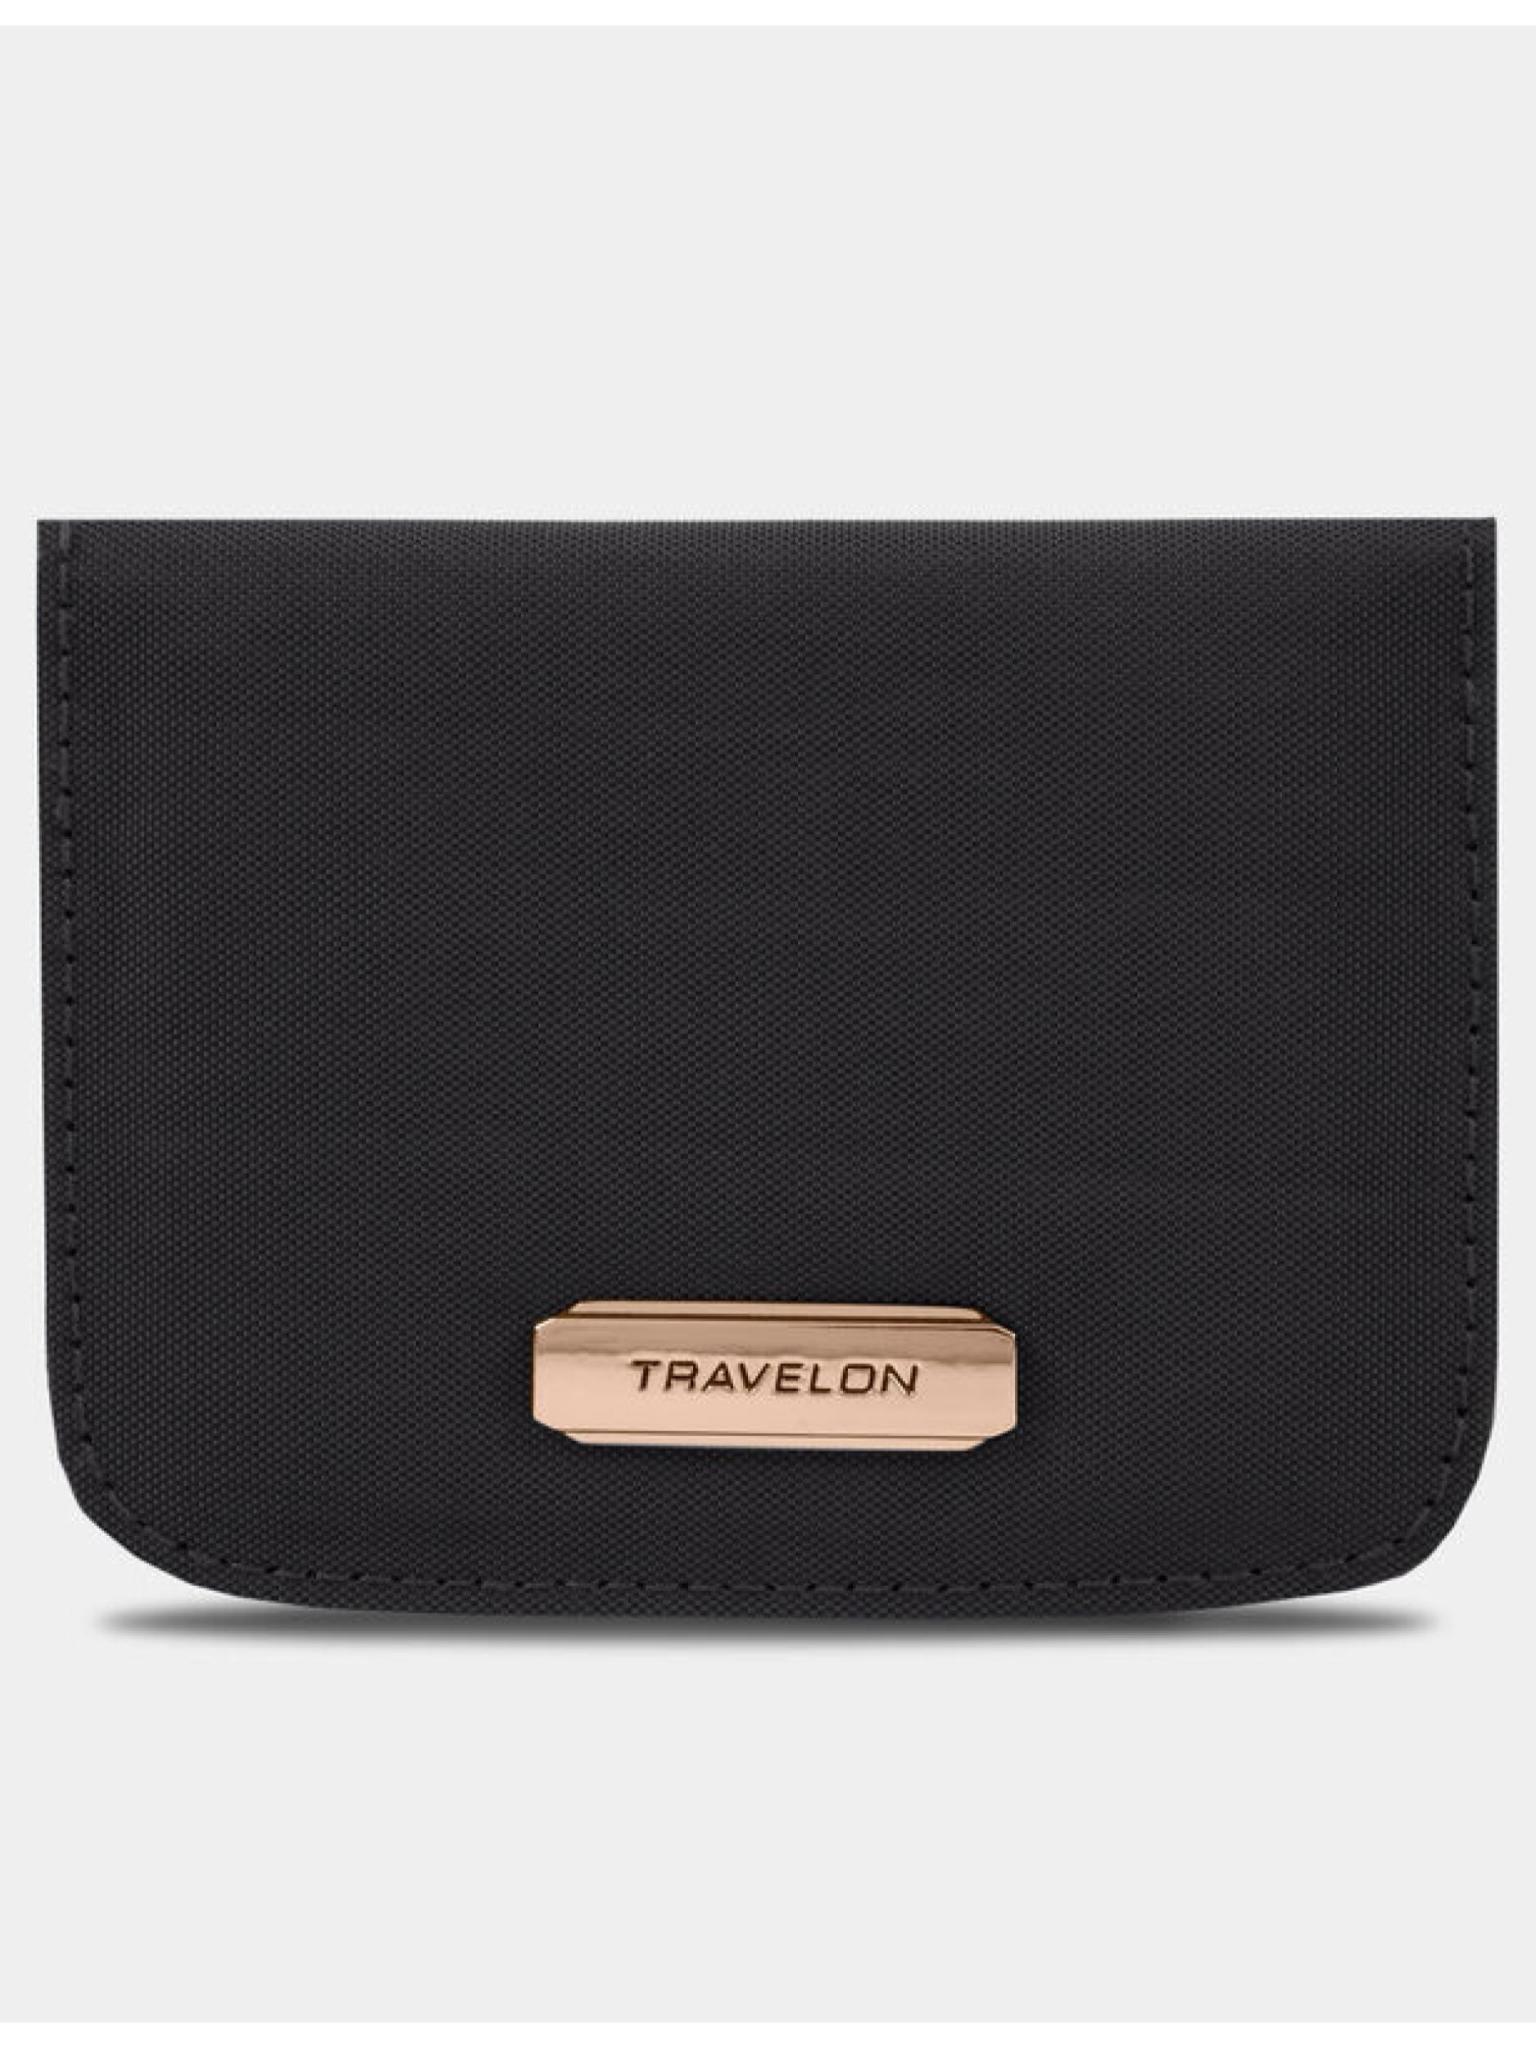 Travelon RFID Bi-Fold Card Case